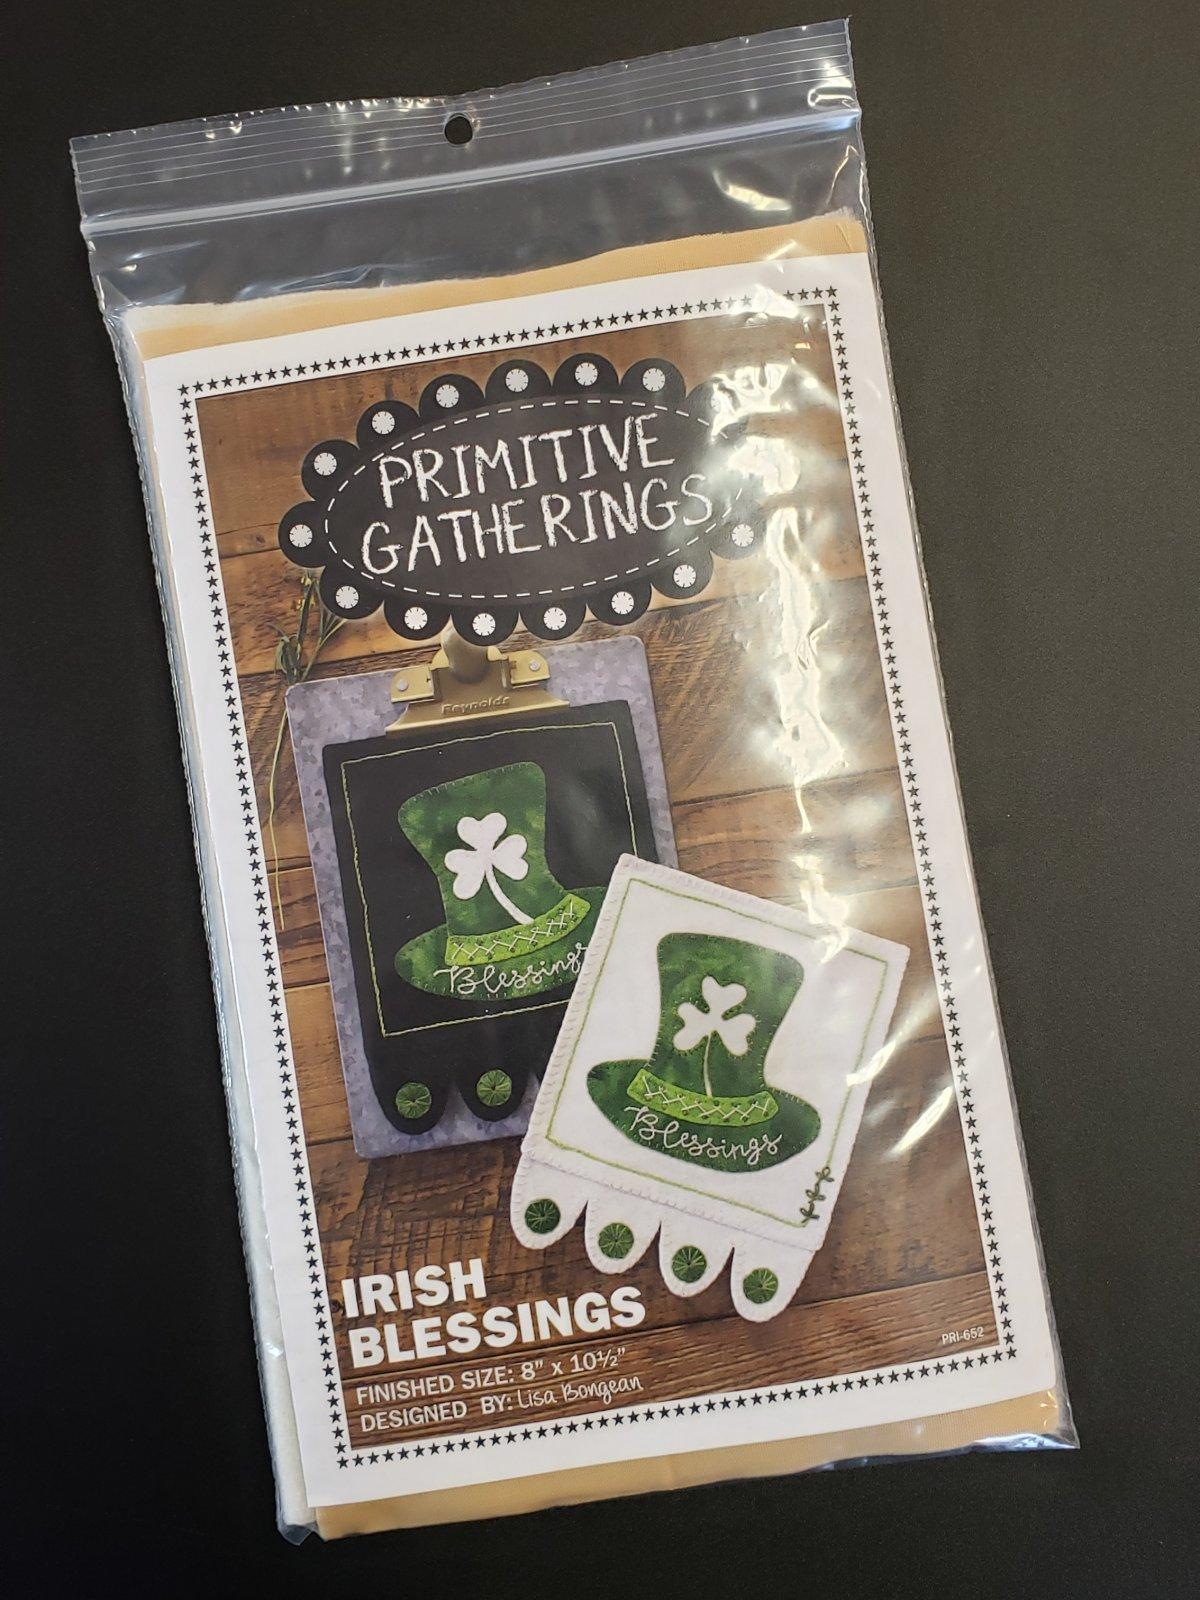 Irish Blessings Kit with Pattern - Light Version